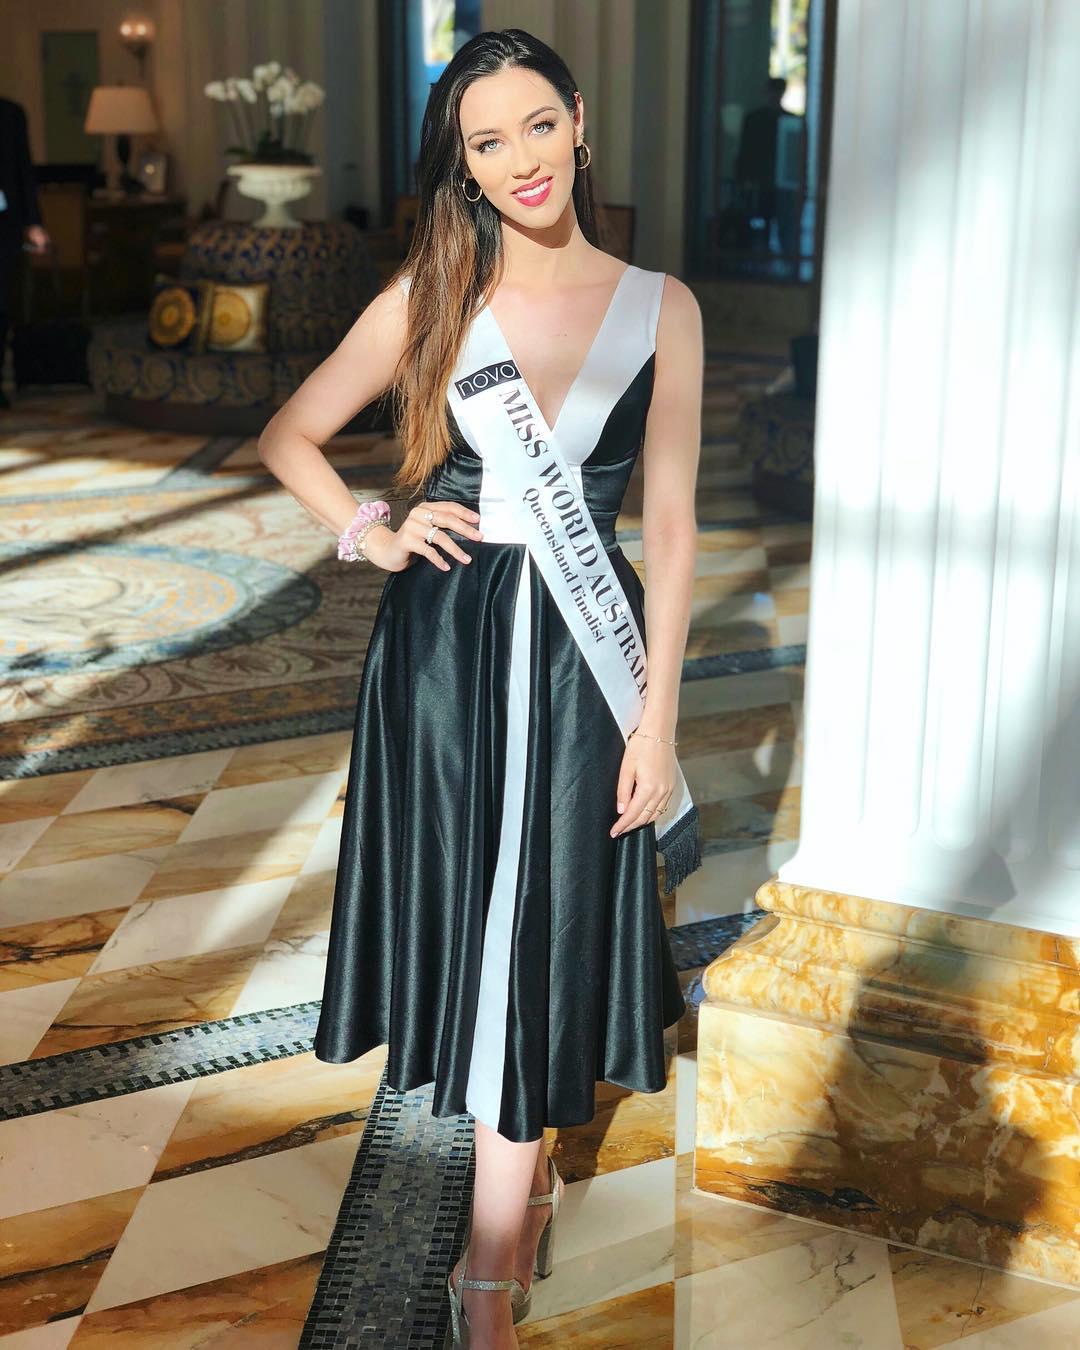 candidatas a miss world australia 2018. final: 31 agosto. - Página 4 Dopw5rza